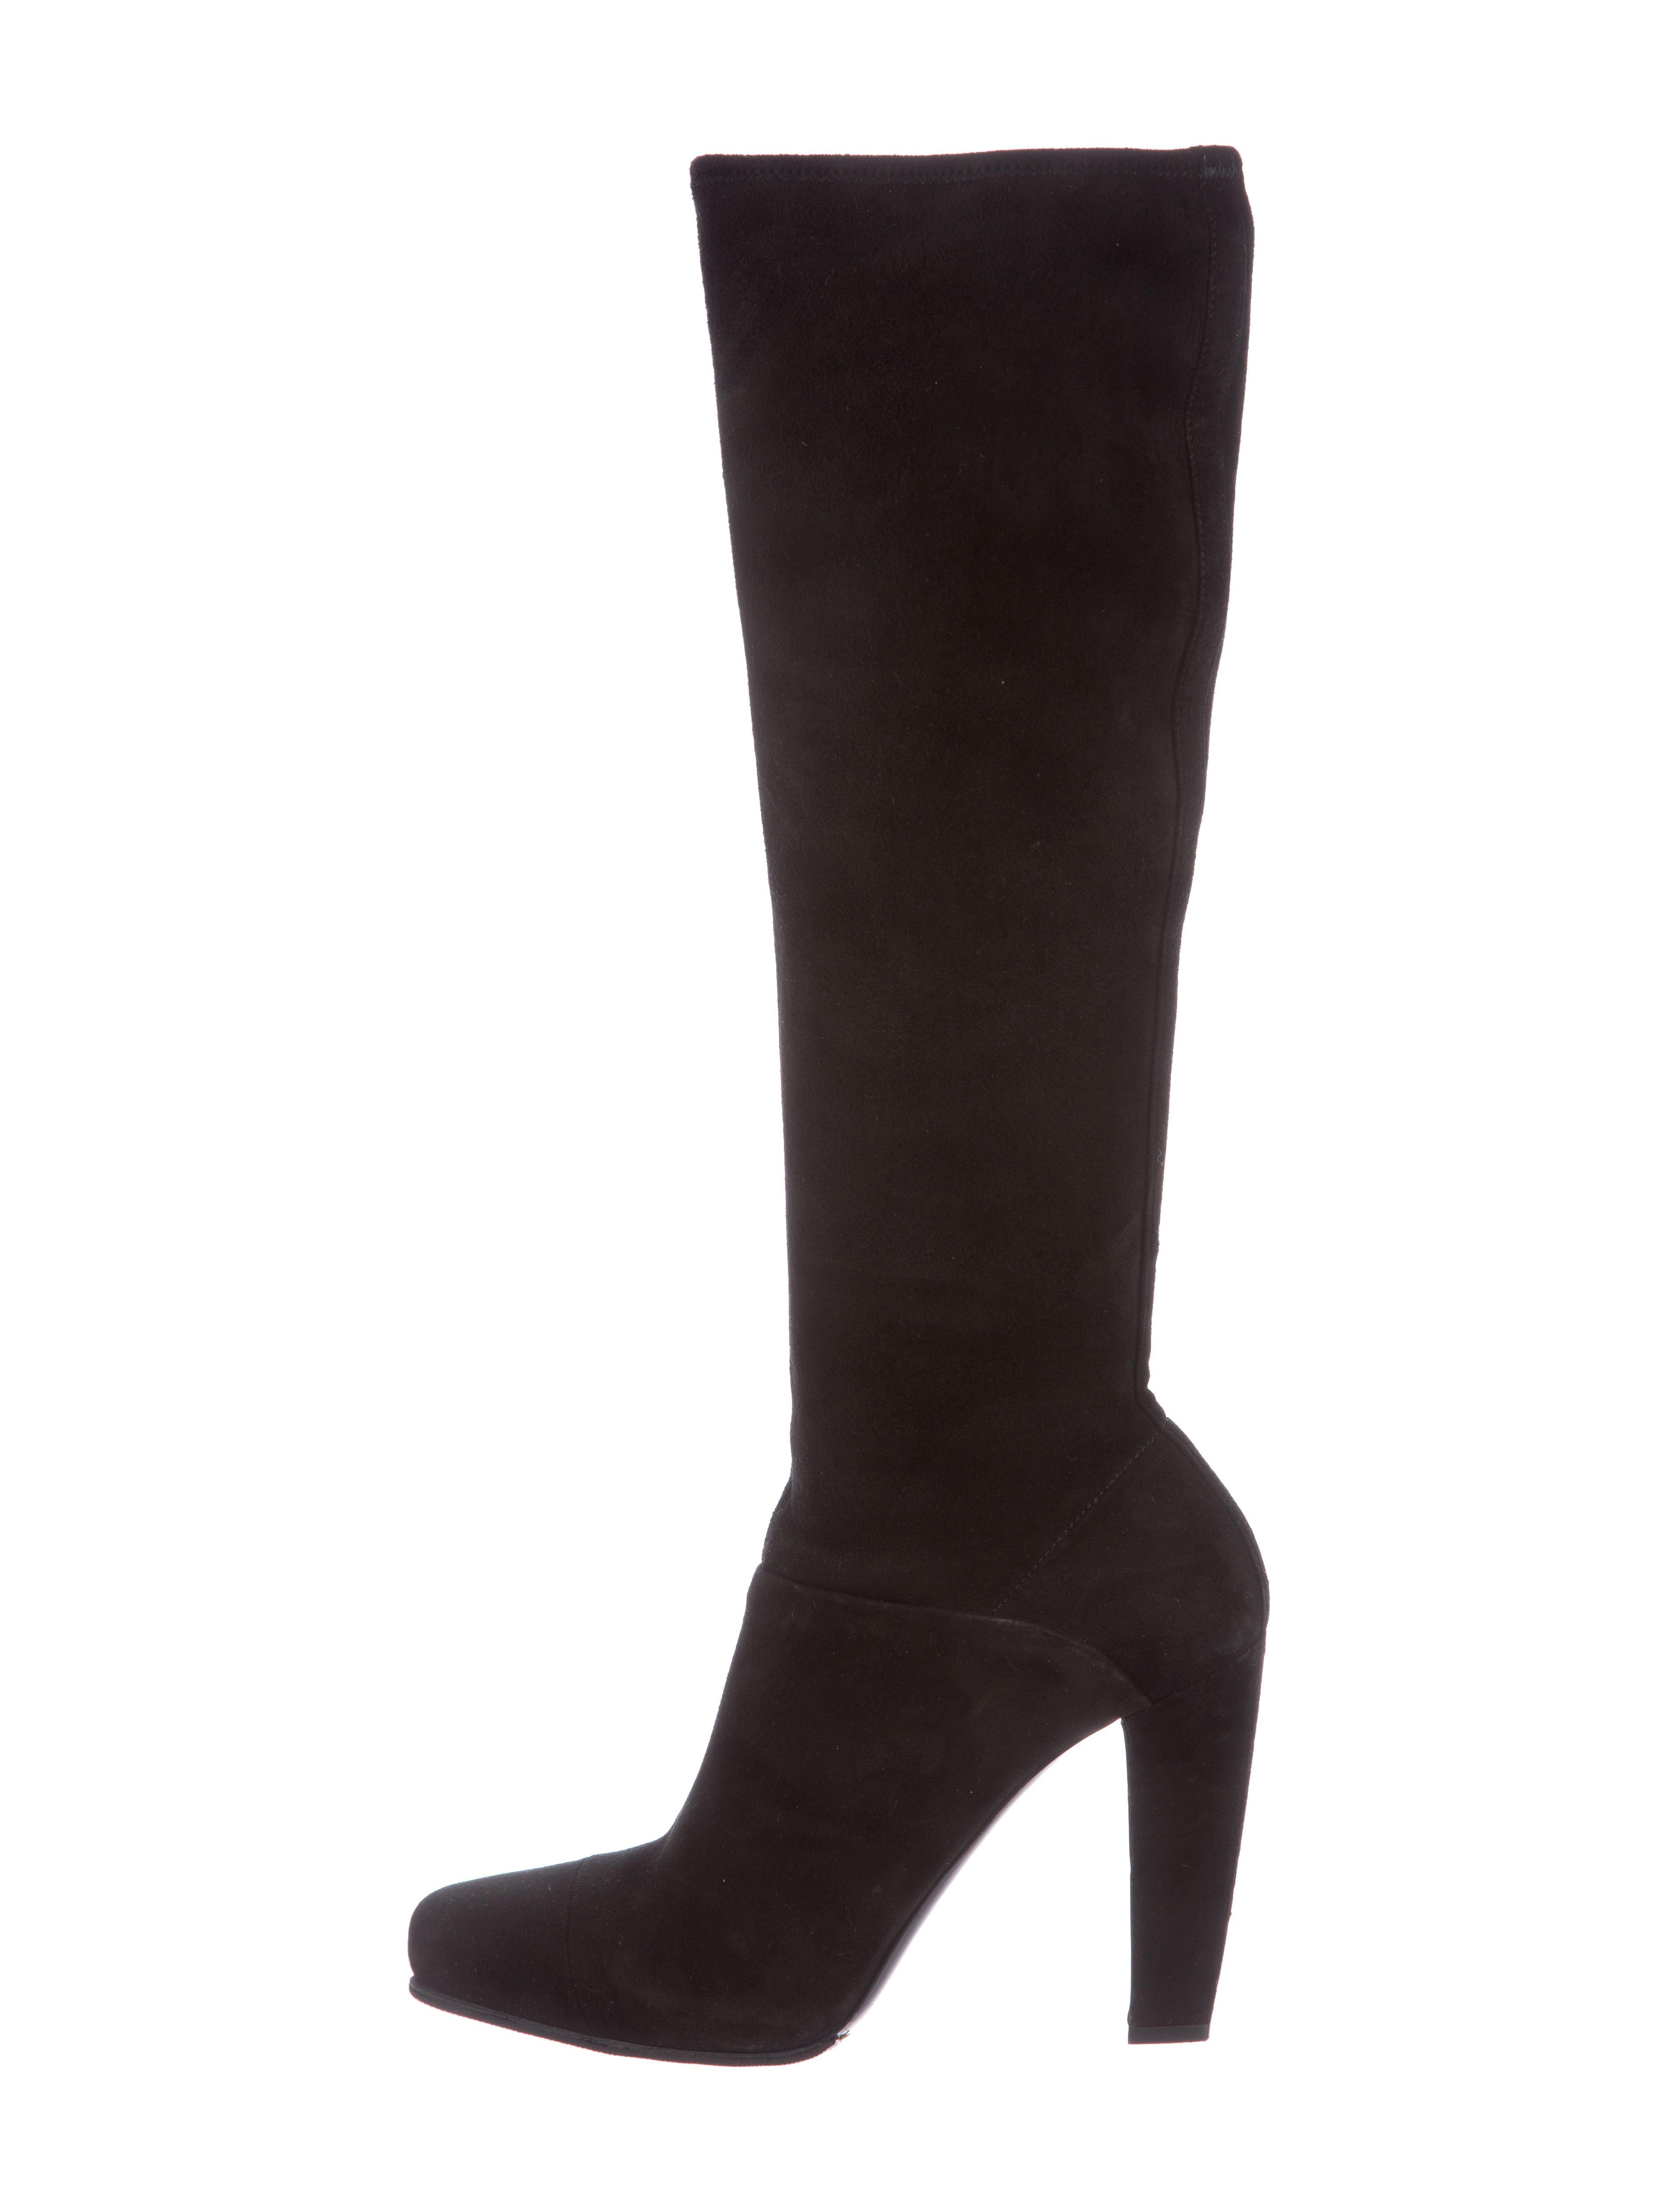 prada suede knee high boots shoes pra109554 the realreal